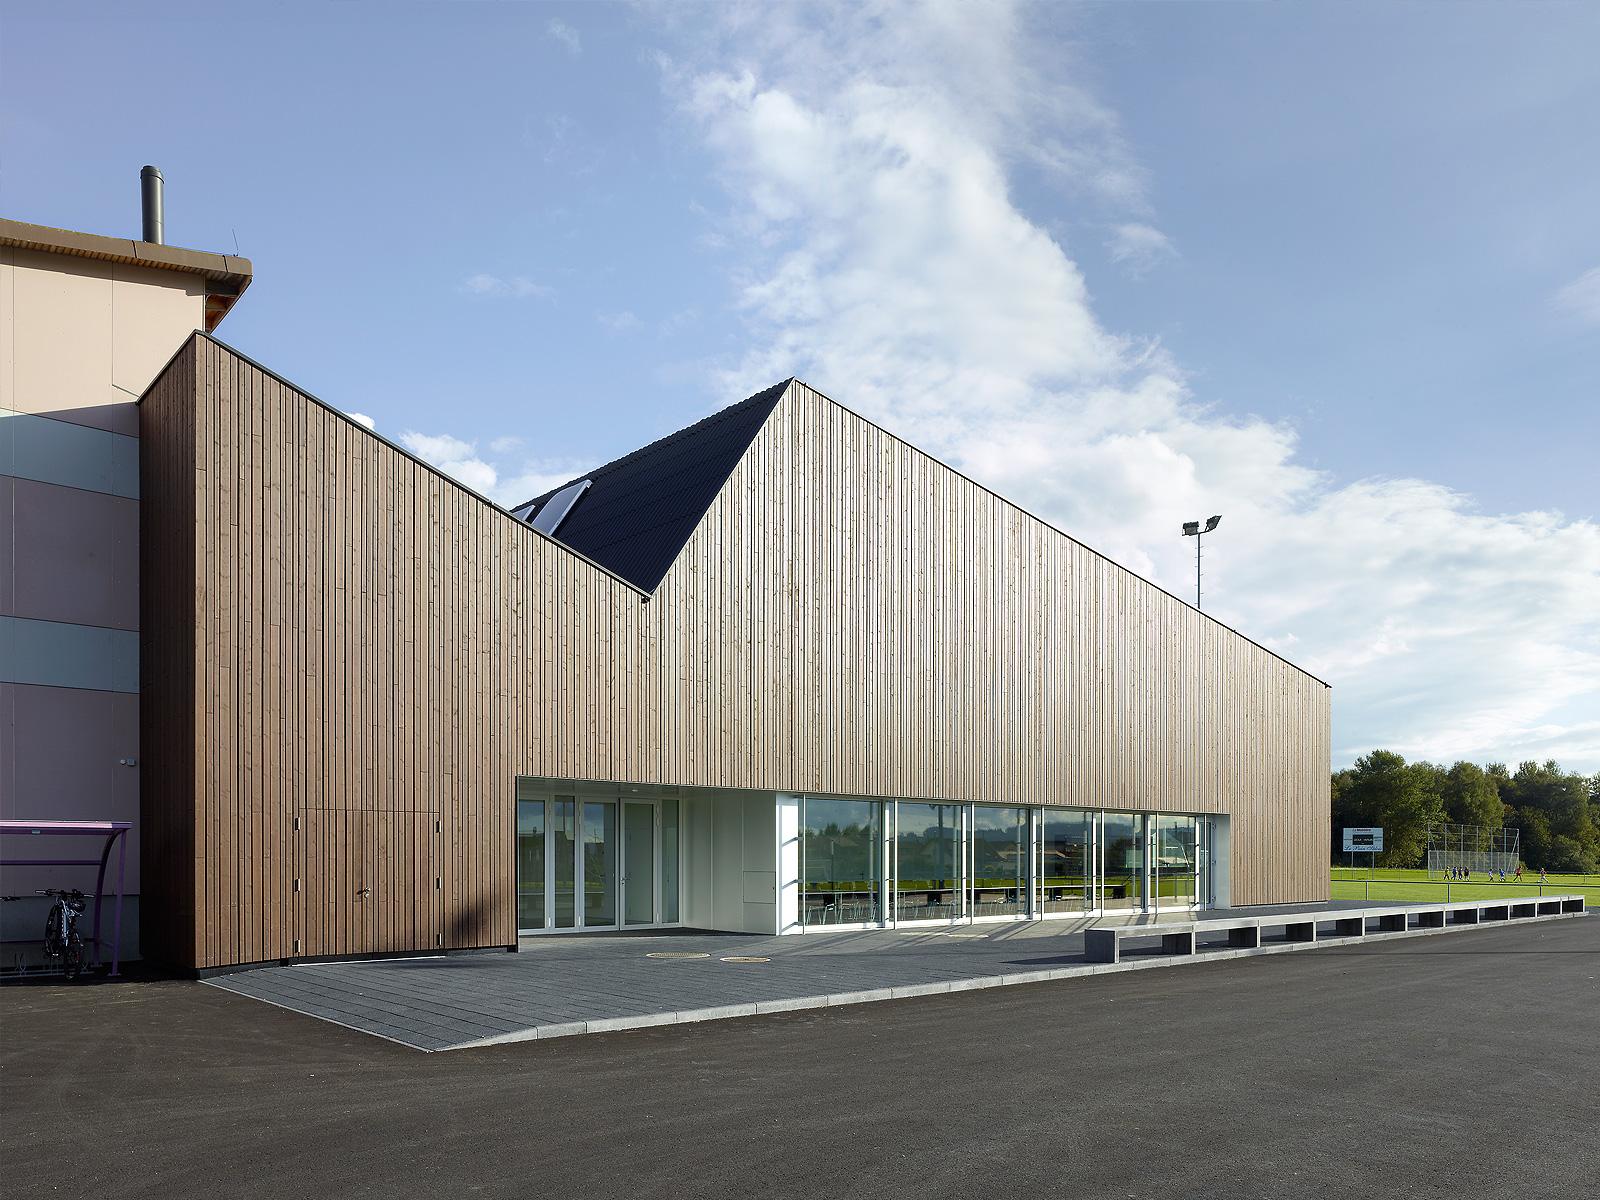 Best architects architektur award acarchitectes alexandre clerc architectes sia - Best architectes ...